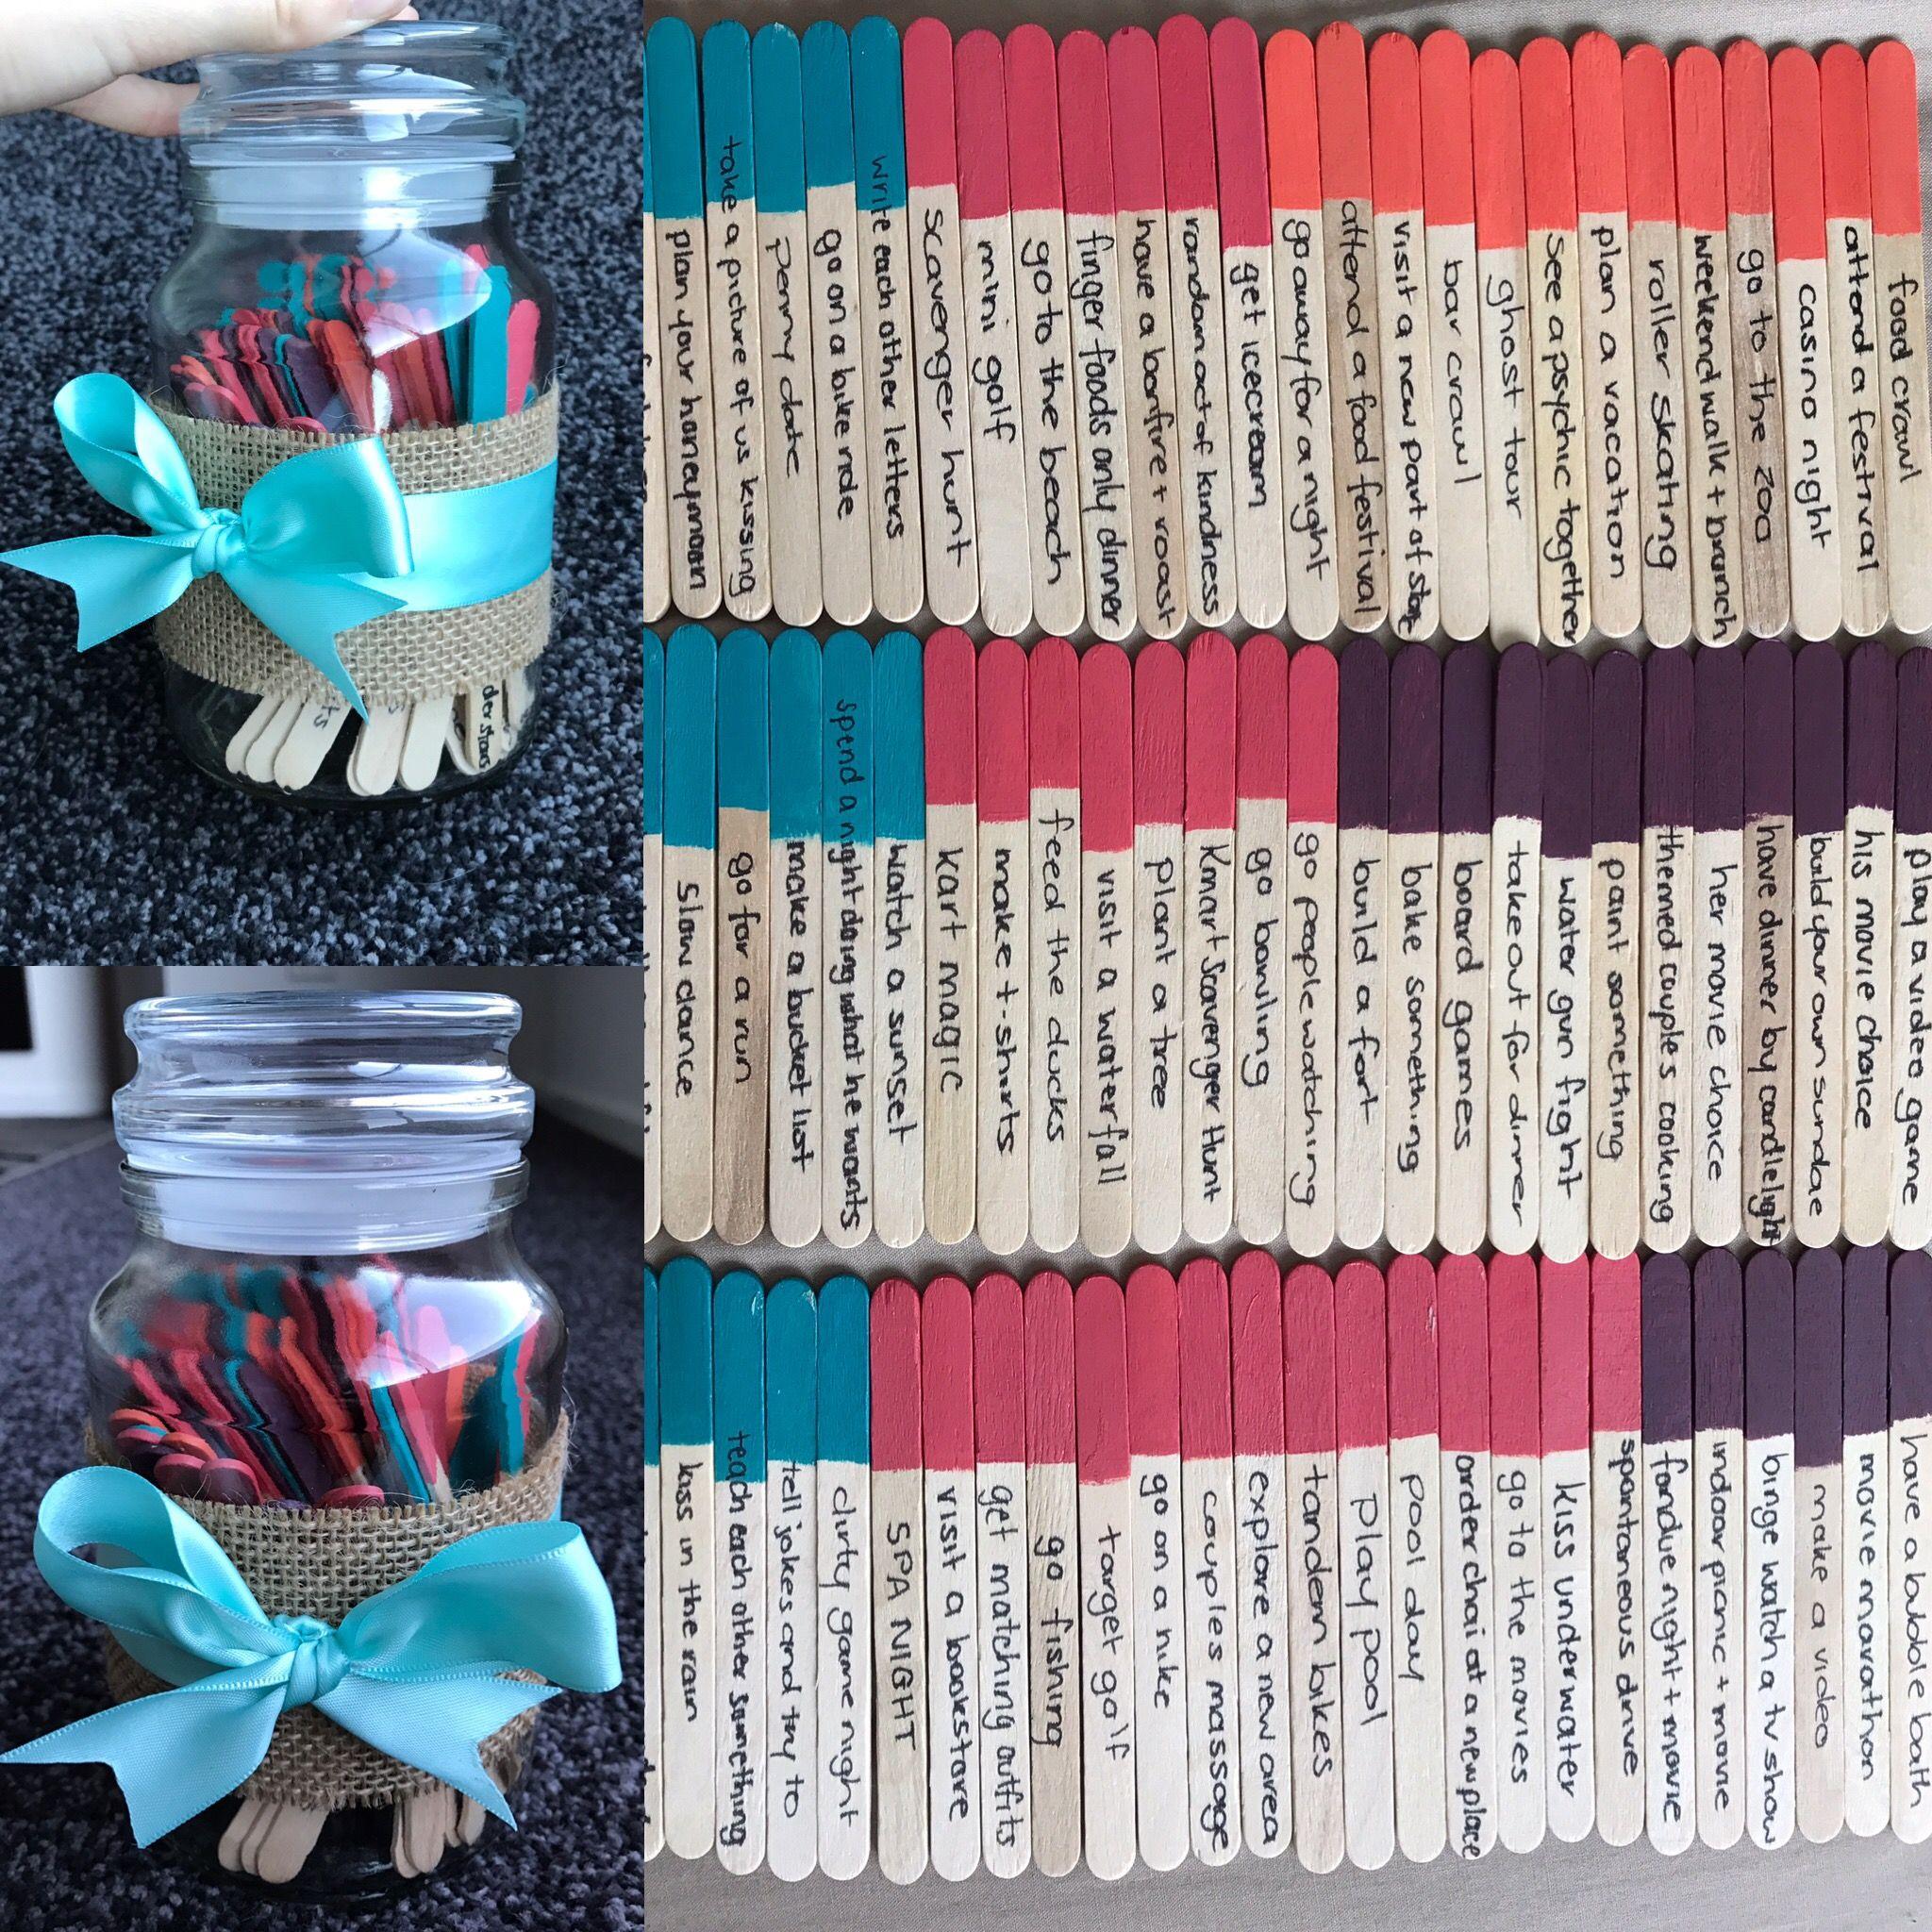 Date Night Jar Ideas Diy Diy Valentine Gifts For Boyfriend Diy Valentines Gifts Diy Valentine S Day Gifts For Boyfriend